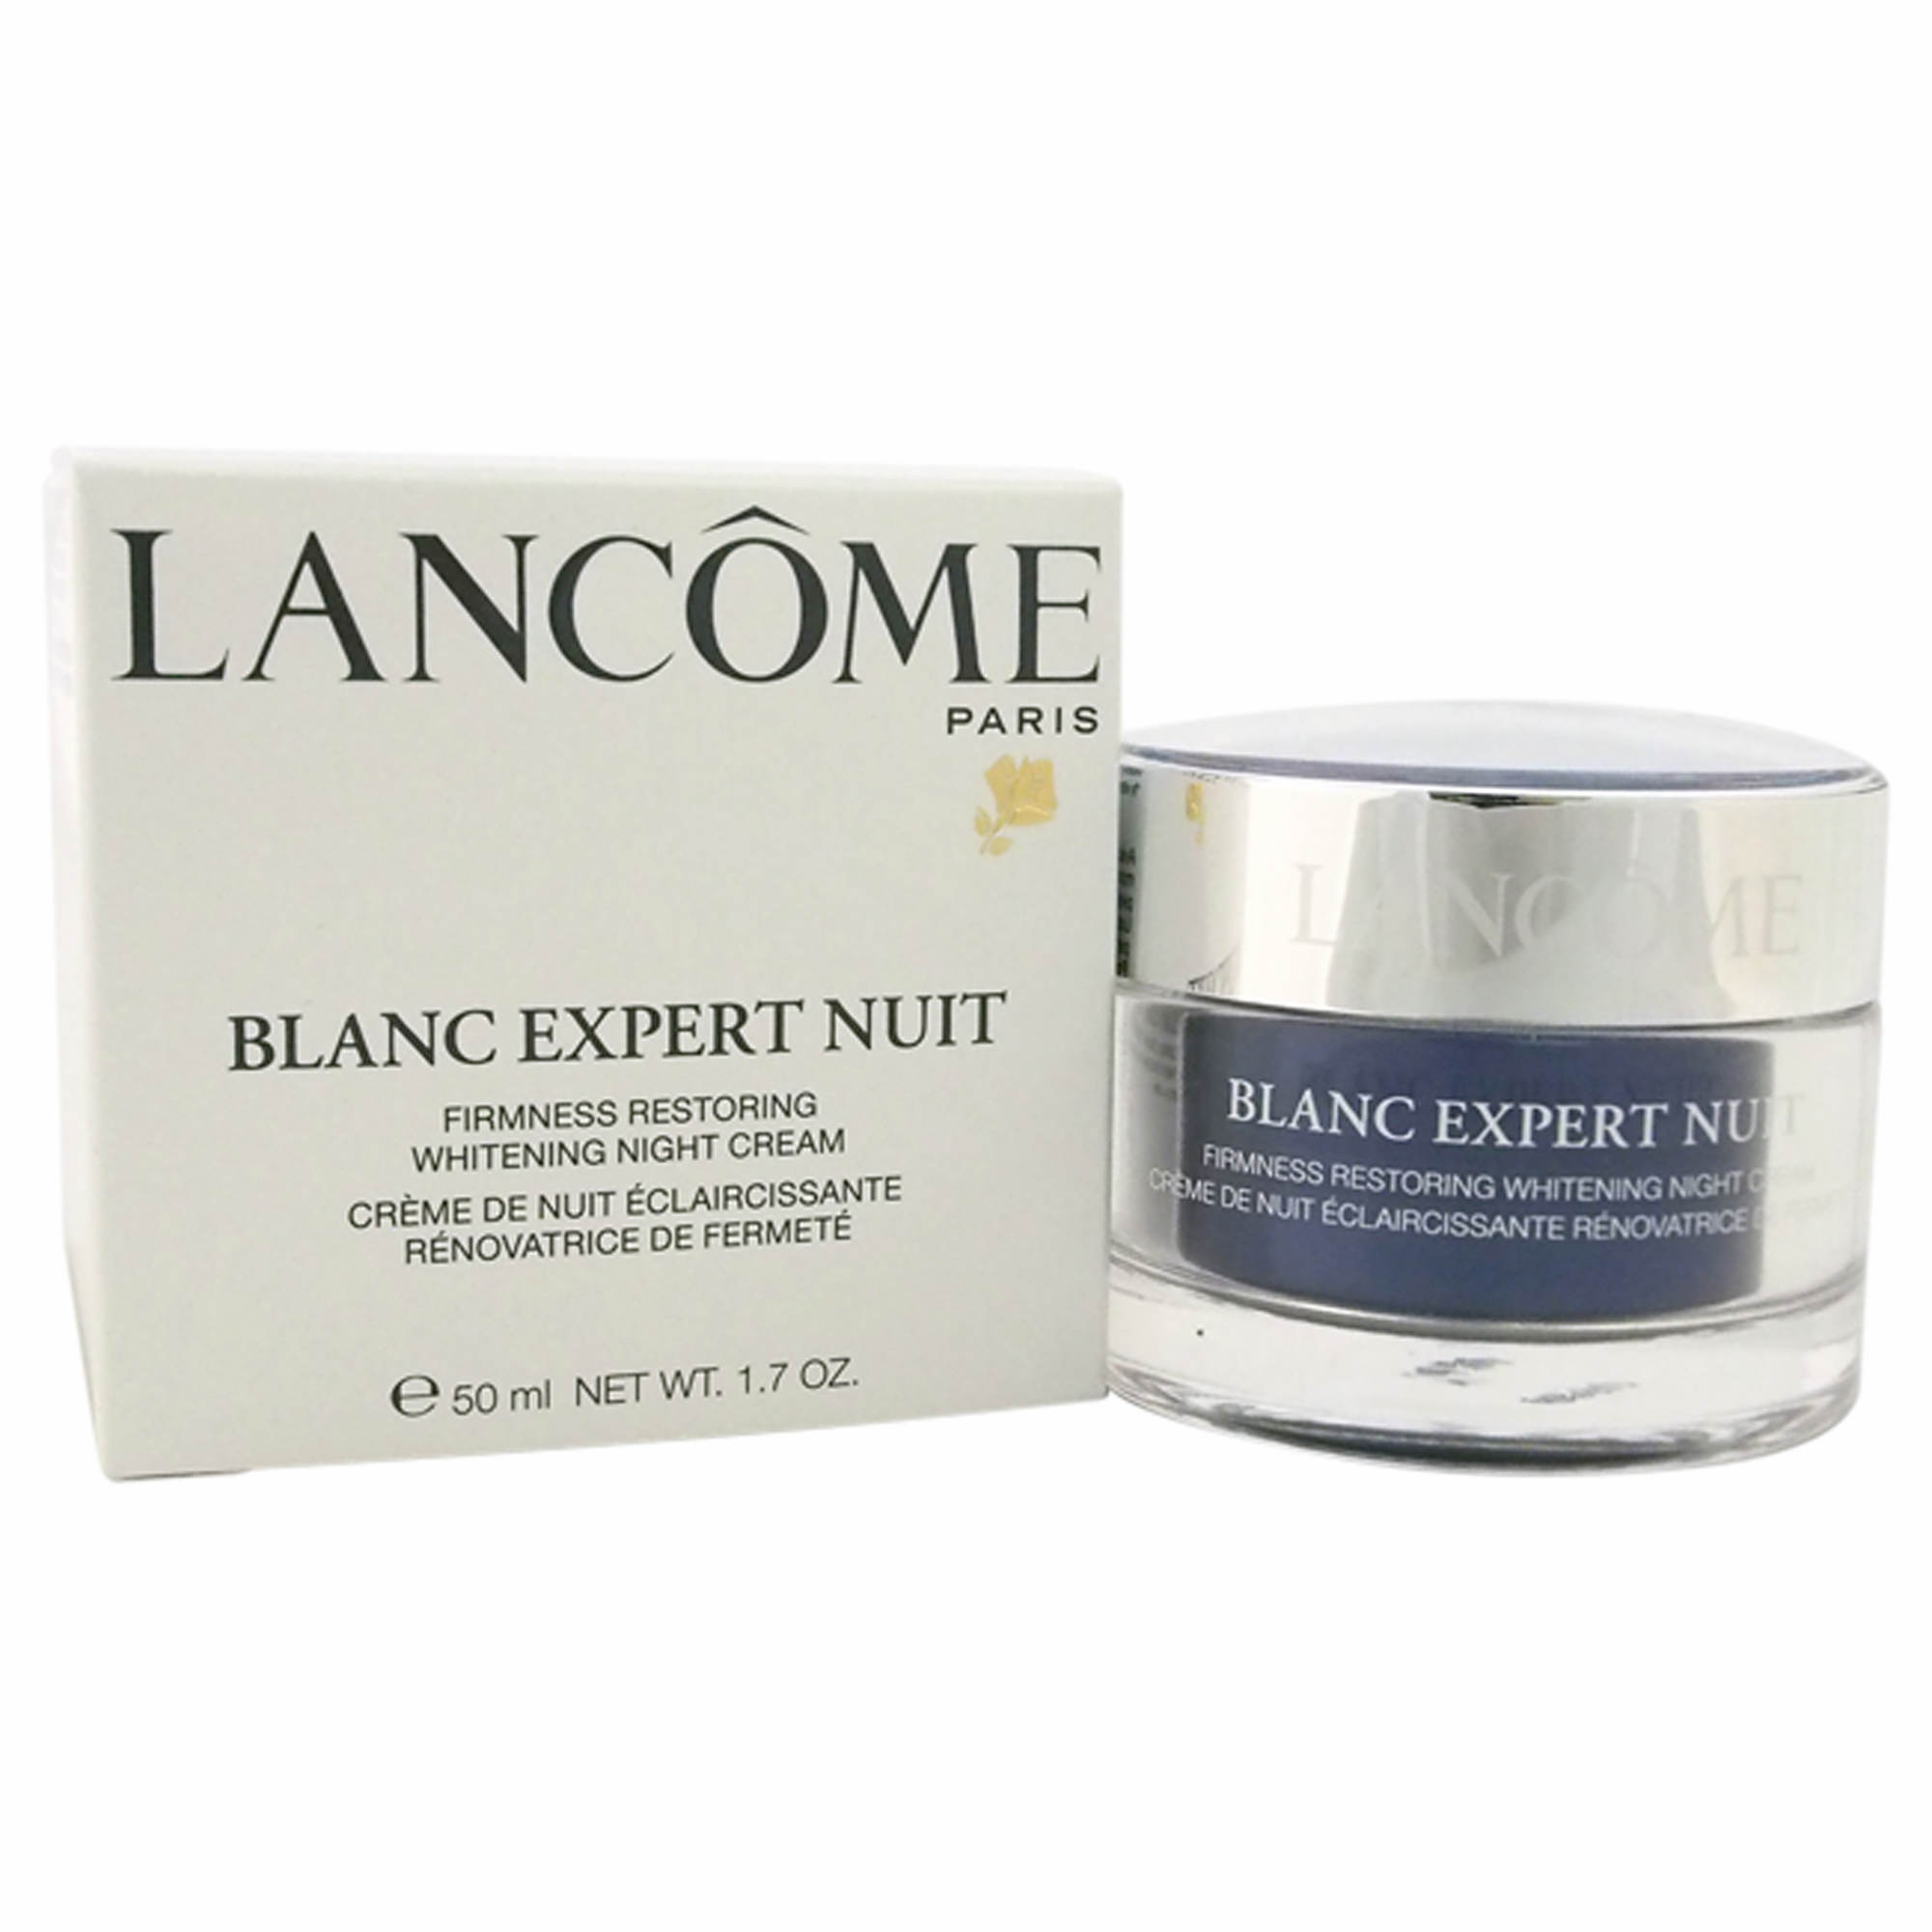 Lancome Blanc Expert Nuit Firmness Restoring Whitening Night Cream, 1.7 oz.